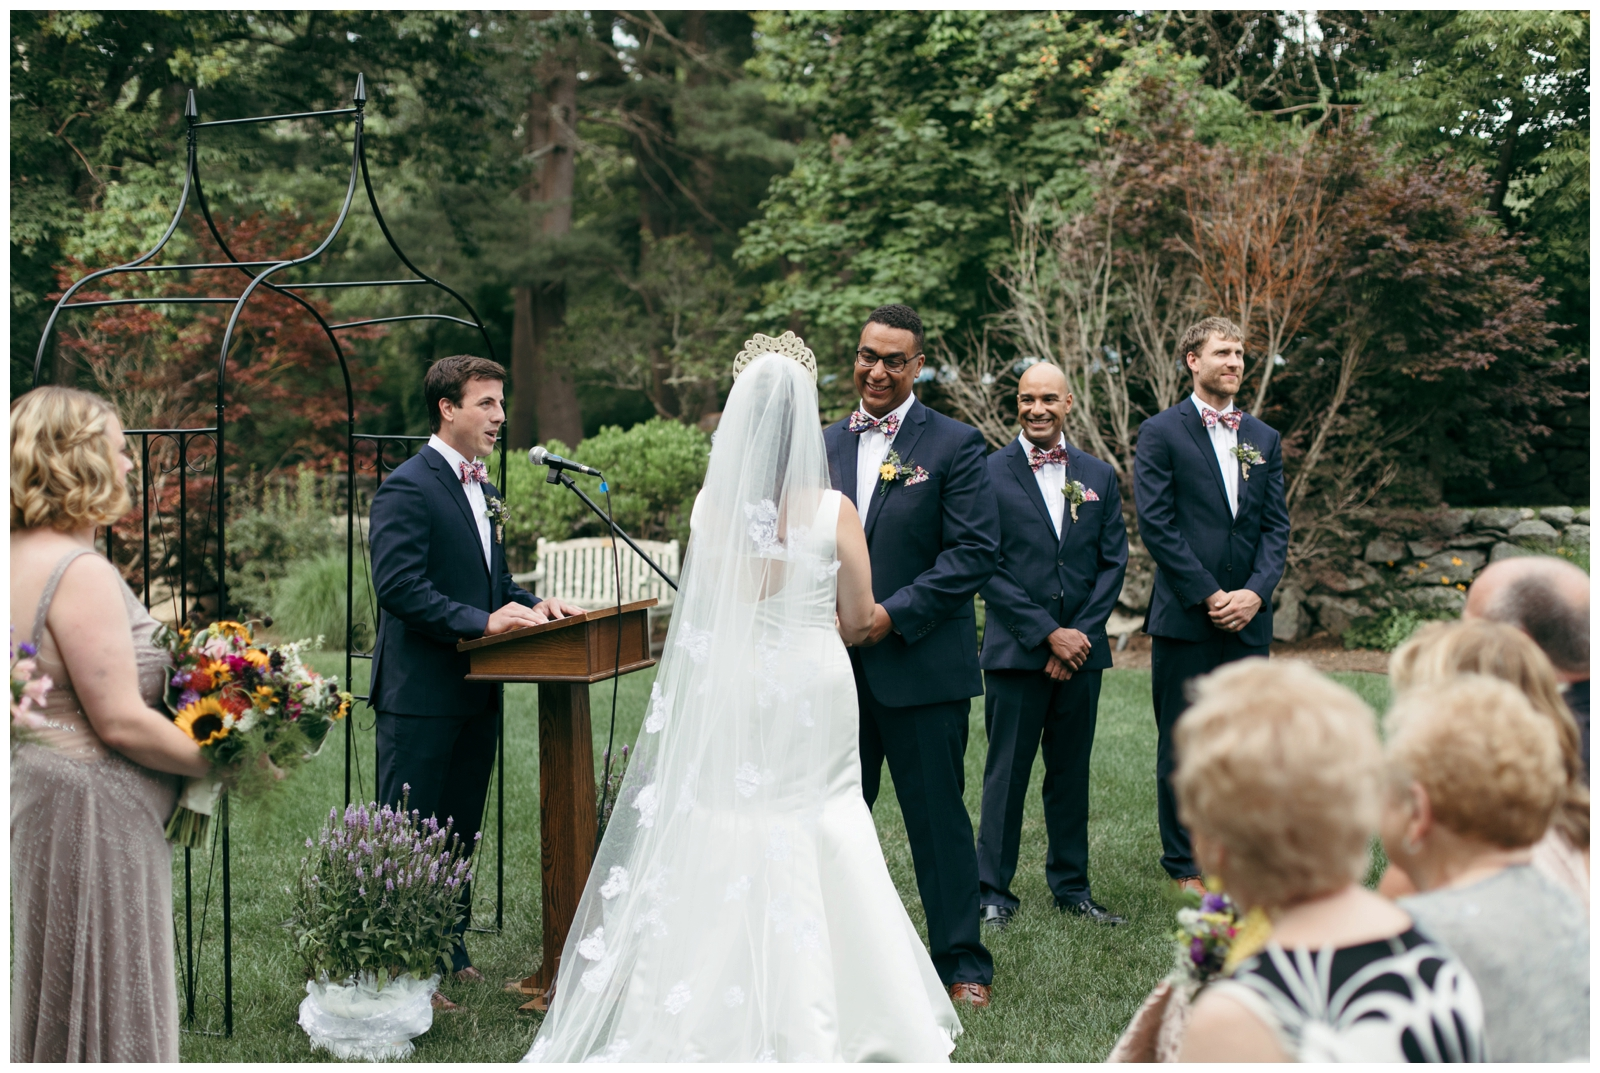 Bailey-Q-Photo-Connors-Center-Wedding-Boston-Wedding-Photographer-045.jpg